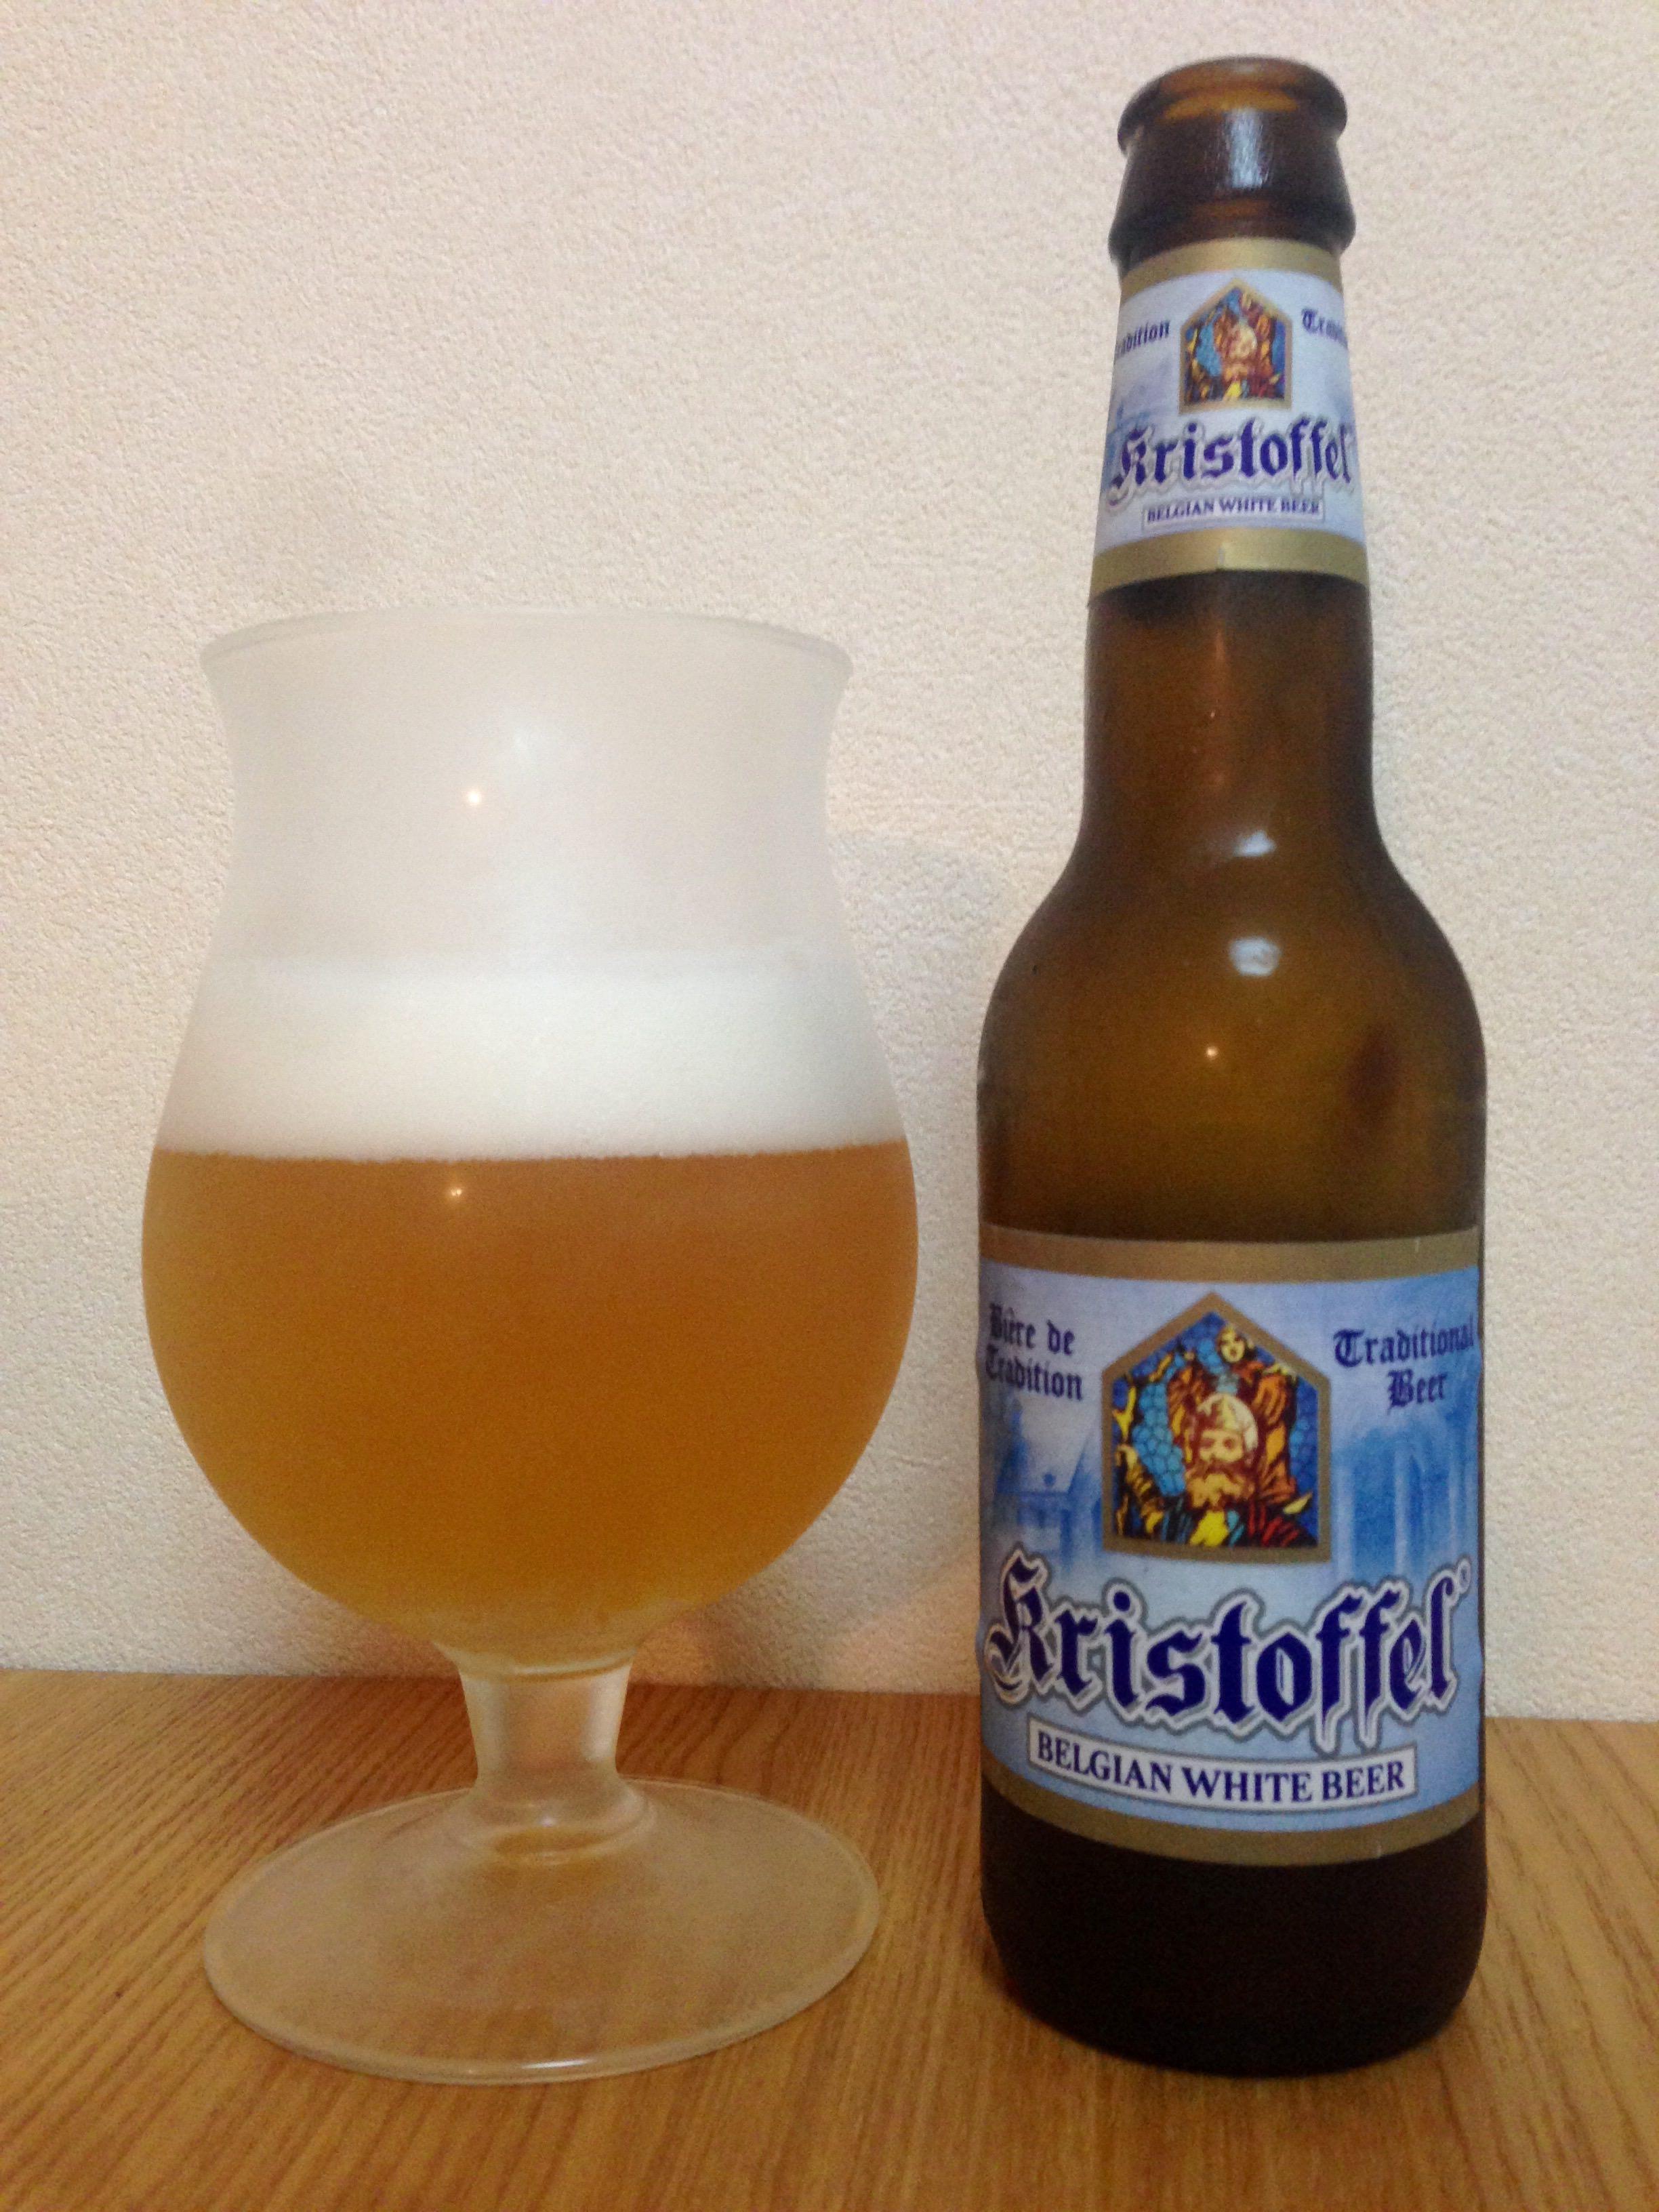 Kristoffel White(クリストフェル ホワイト)